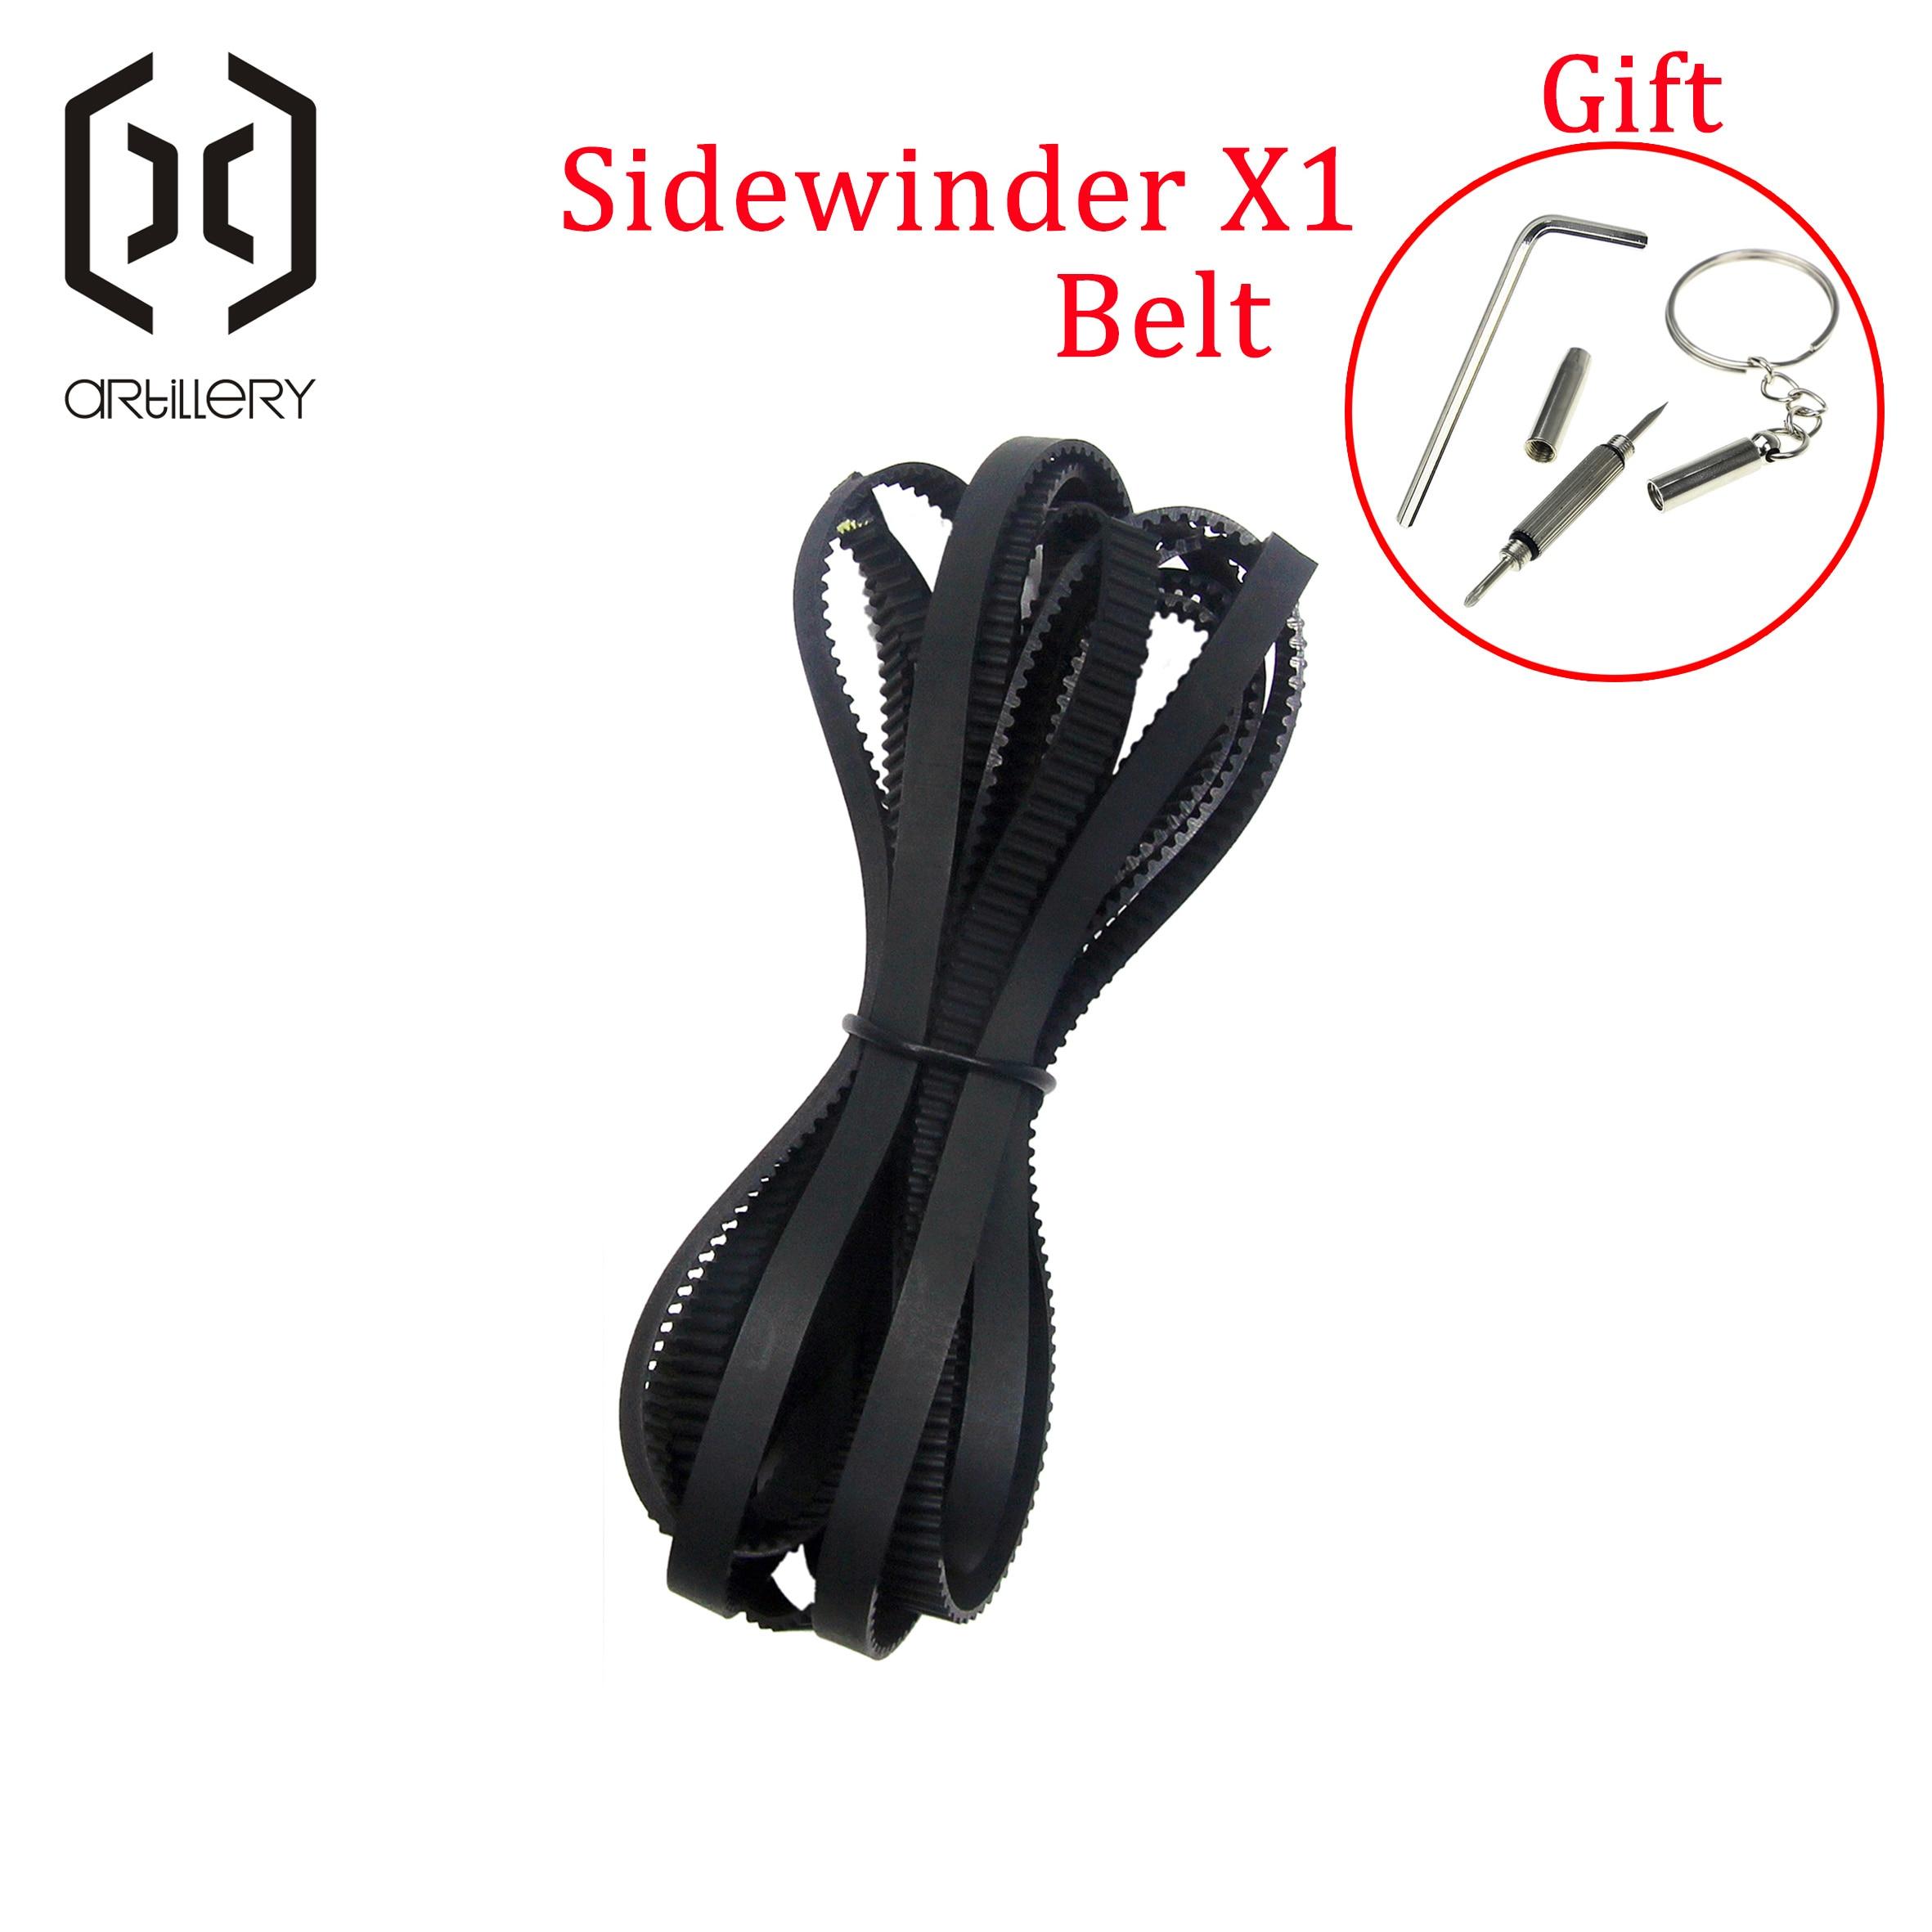 2020      artillery 3D Printer Sidewinder X1 AND Genius Belt